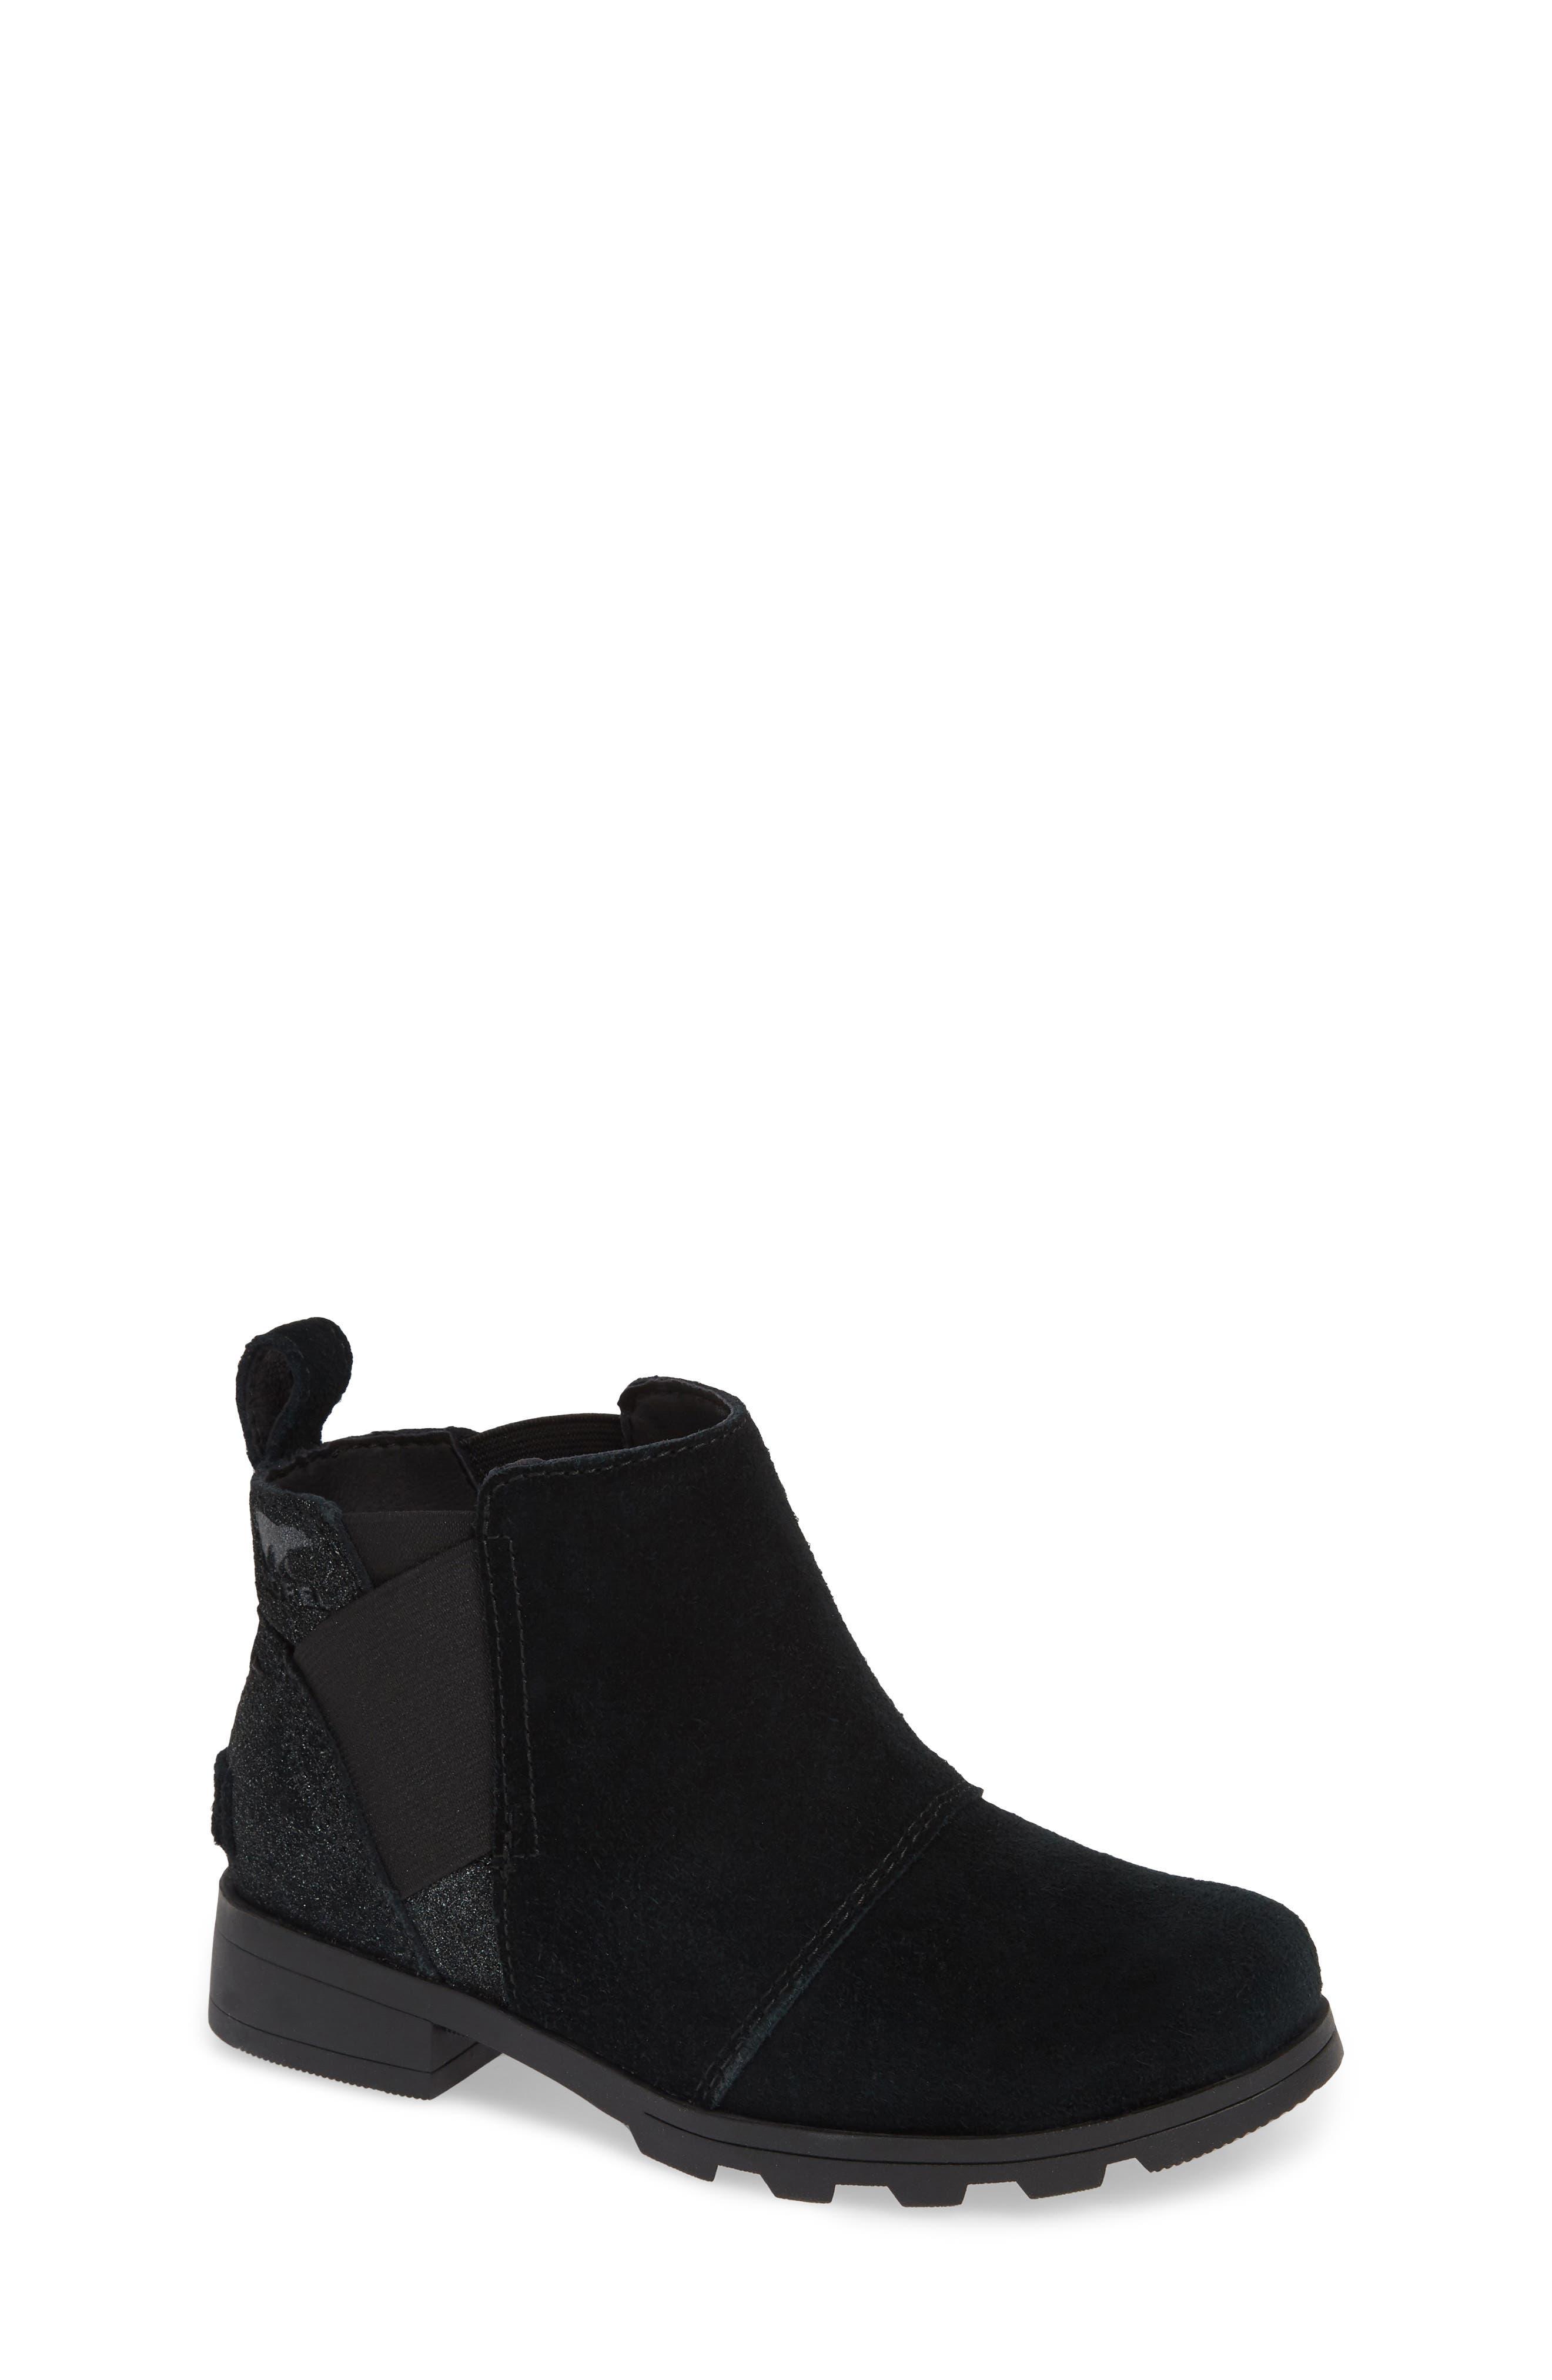 Emelie Waterproof Chelsea Boot,                             Main thumbnail 1, color,                             BLACK